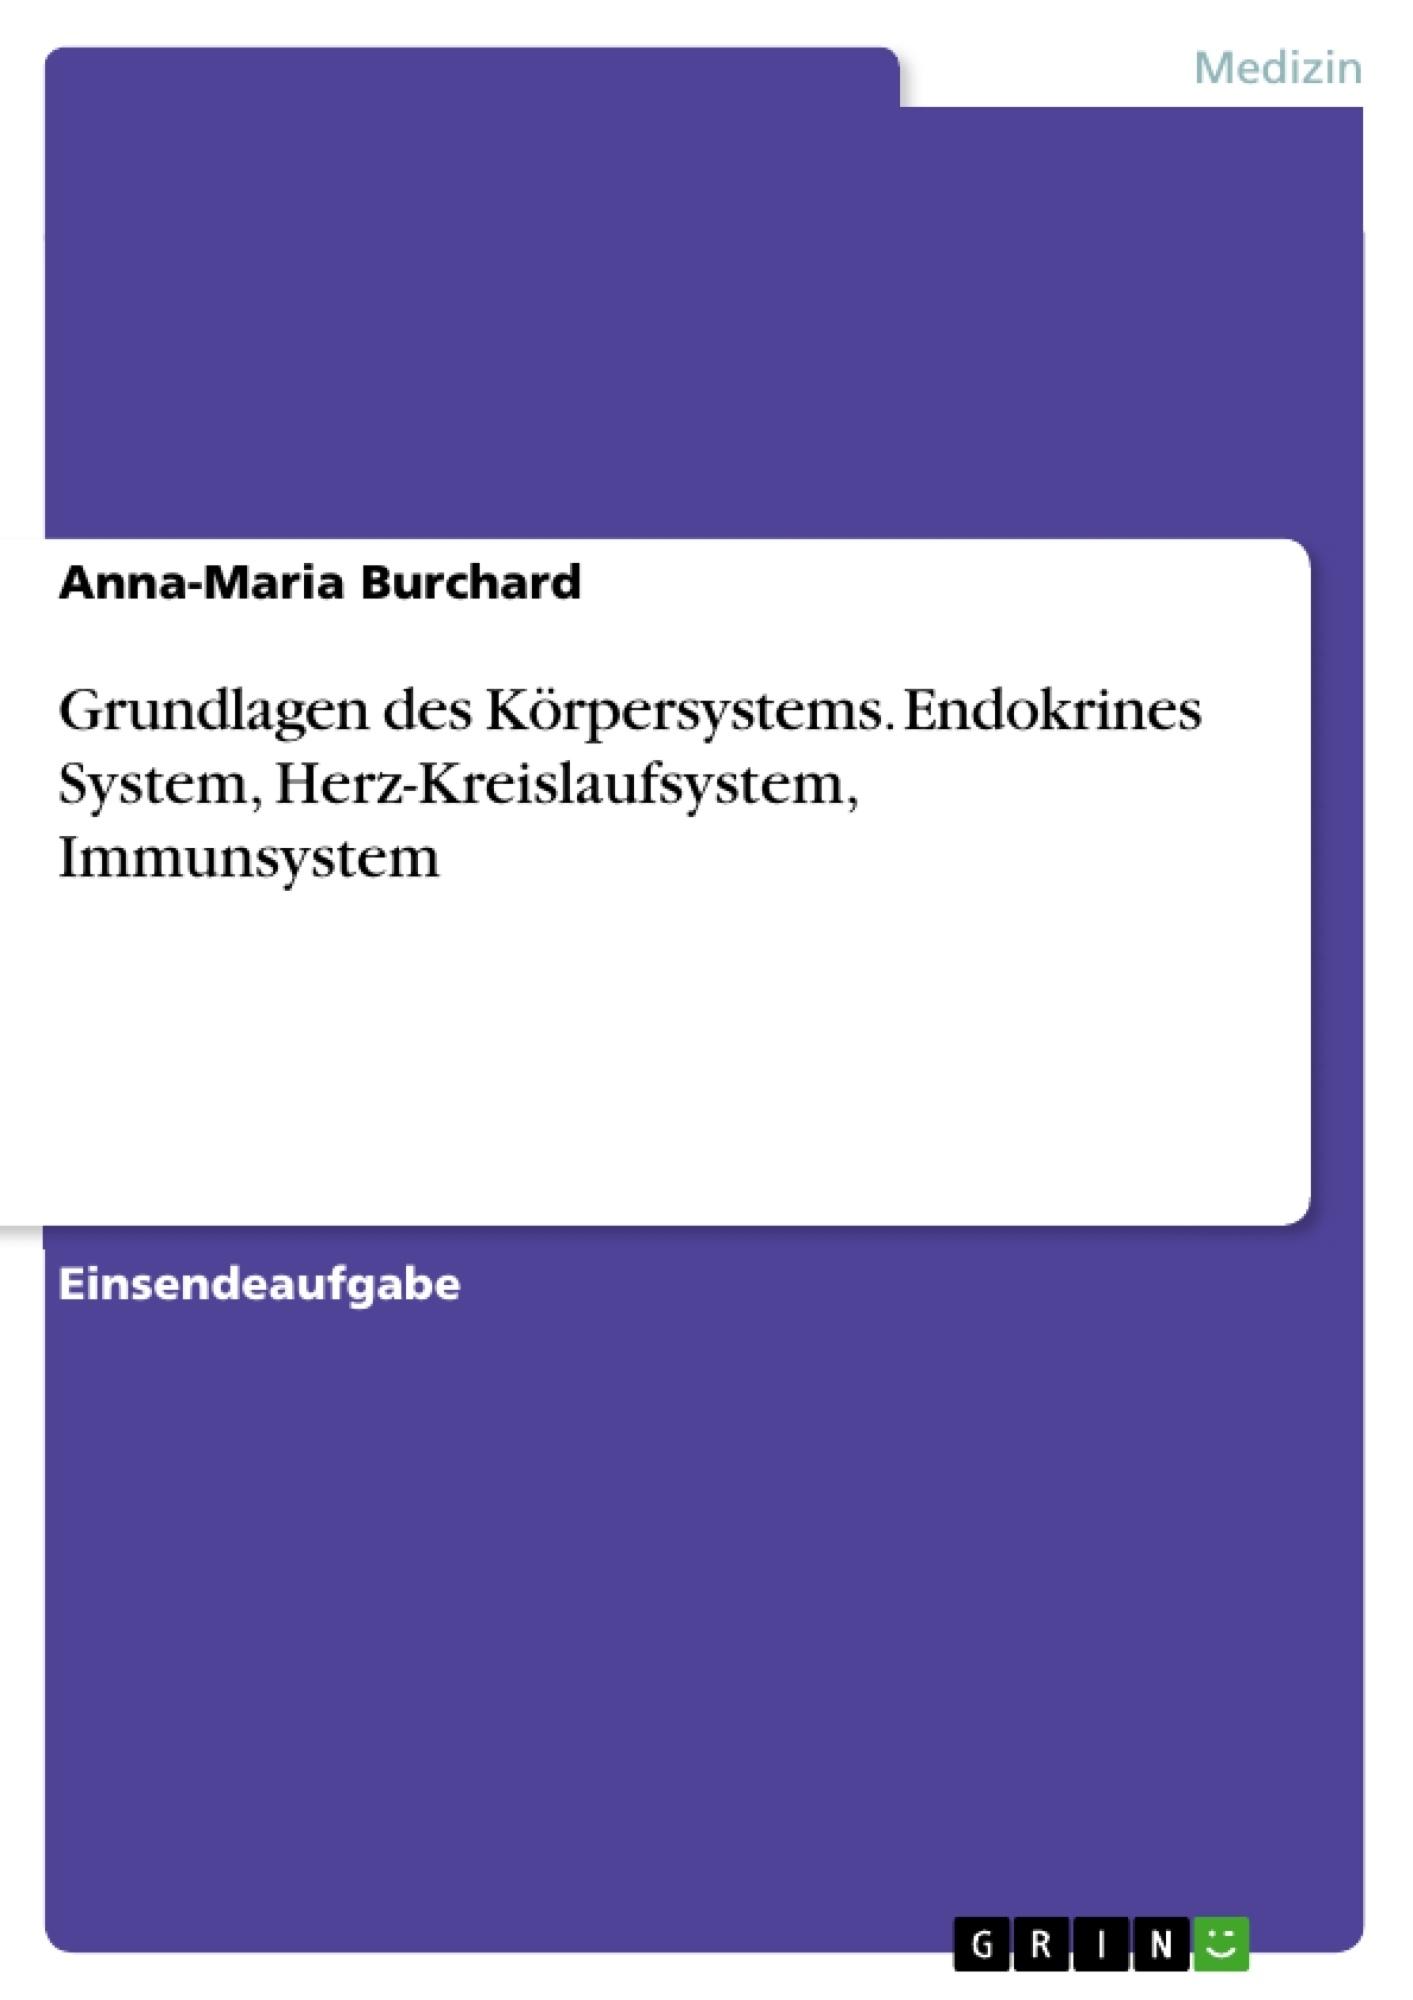 Titel: Grundlagen des Körpersystems. Endokrines System, Herz-Kreislaufsystem, Immunsystem